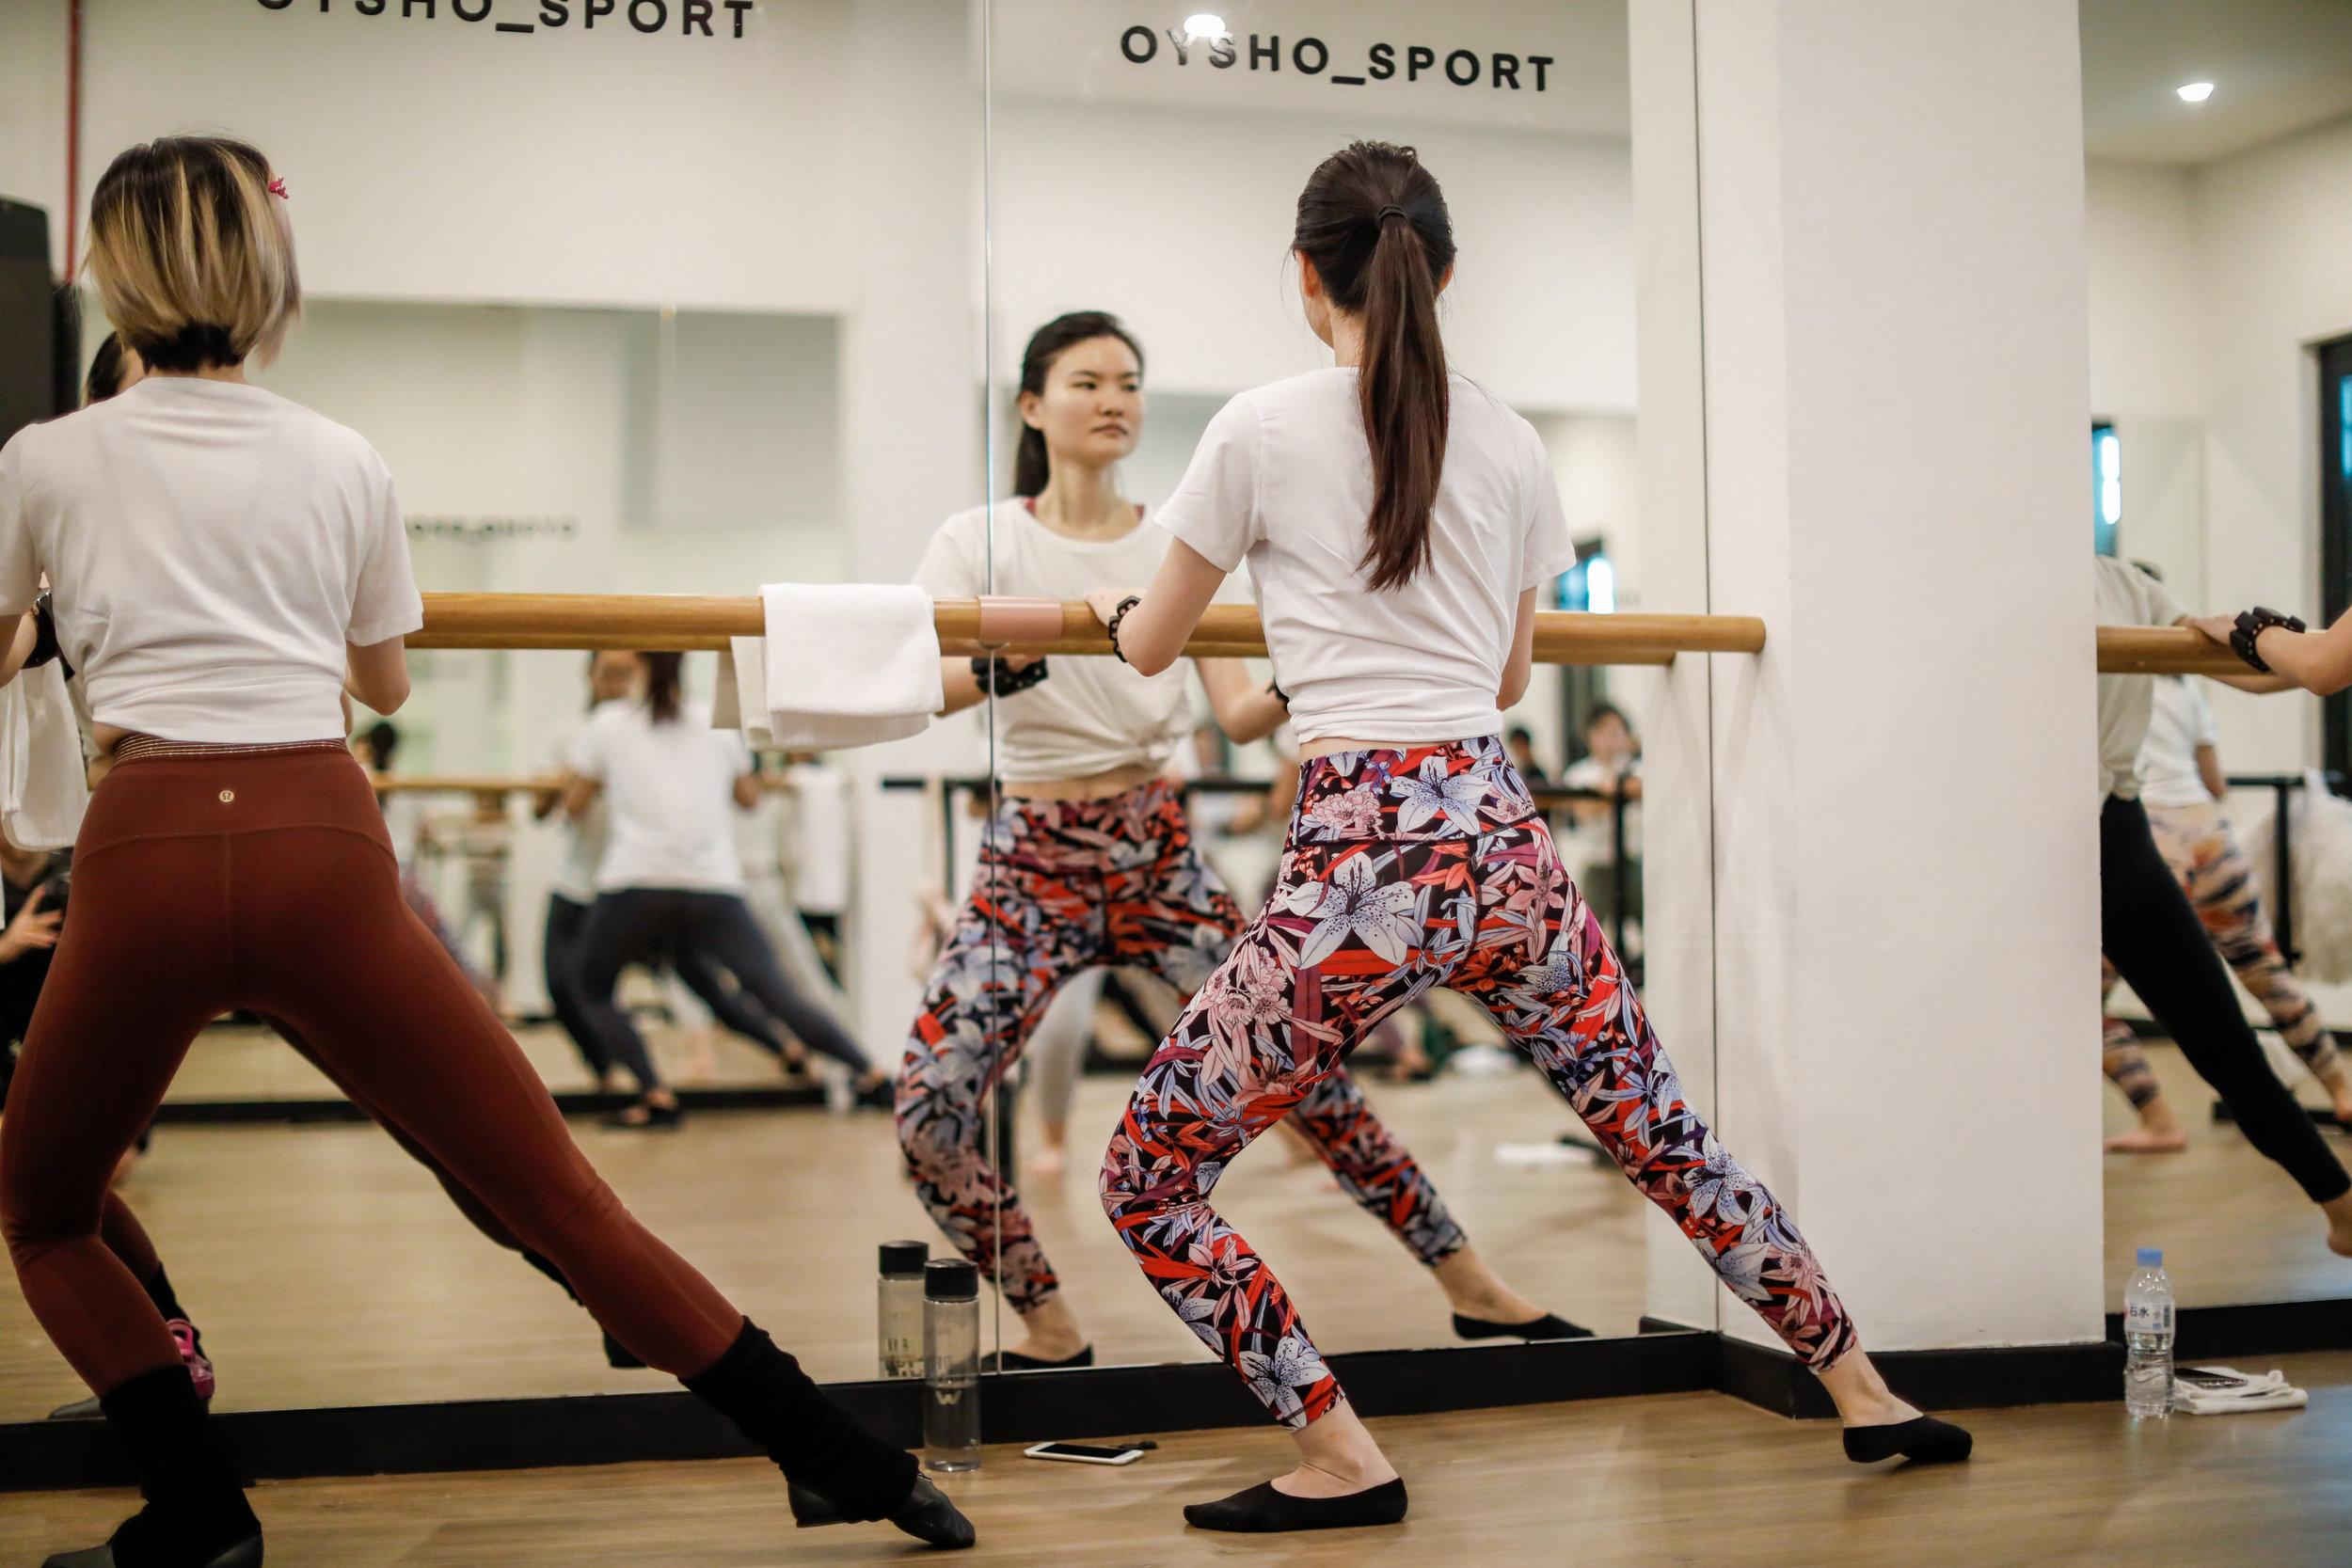 ClassPass(BalletBody-OYSHO_SPORT)-19.jpg